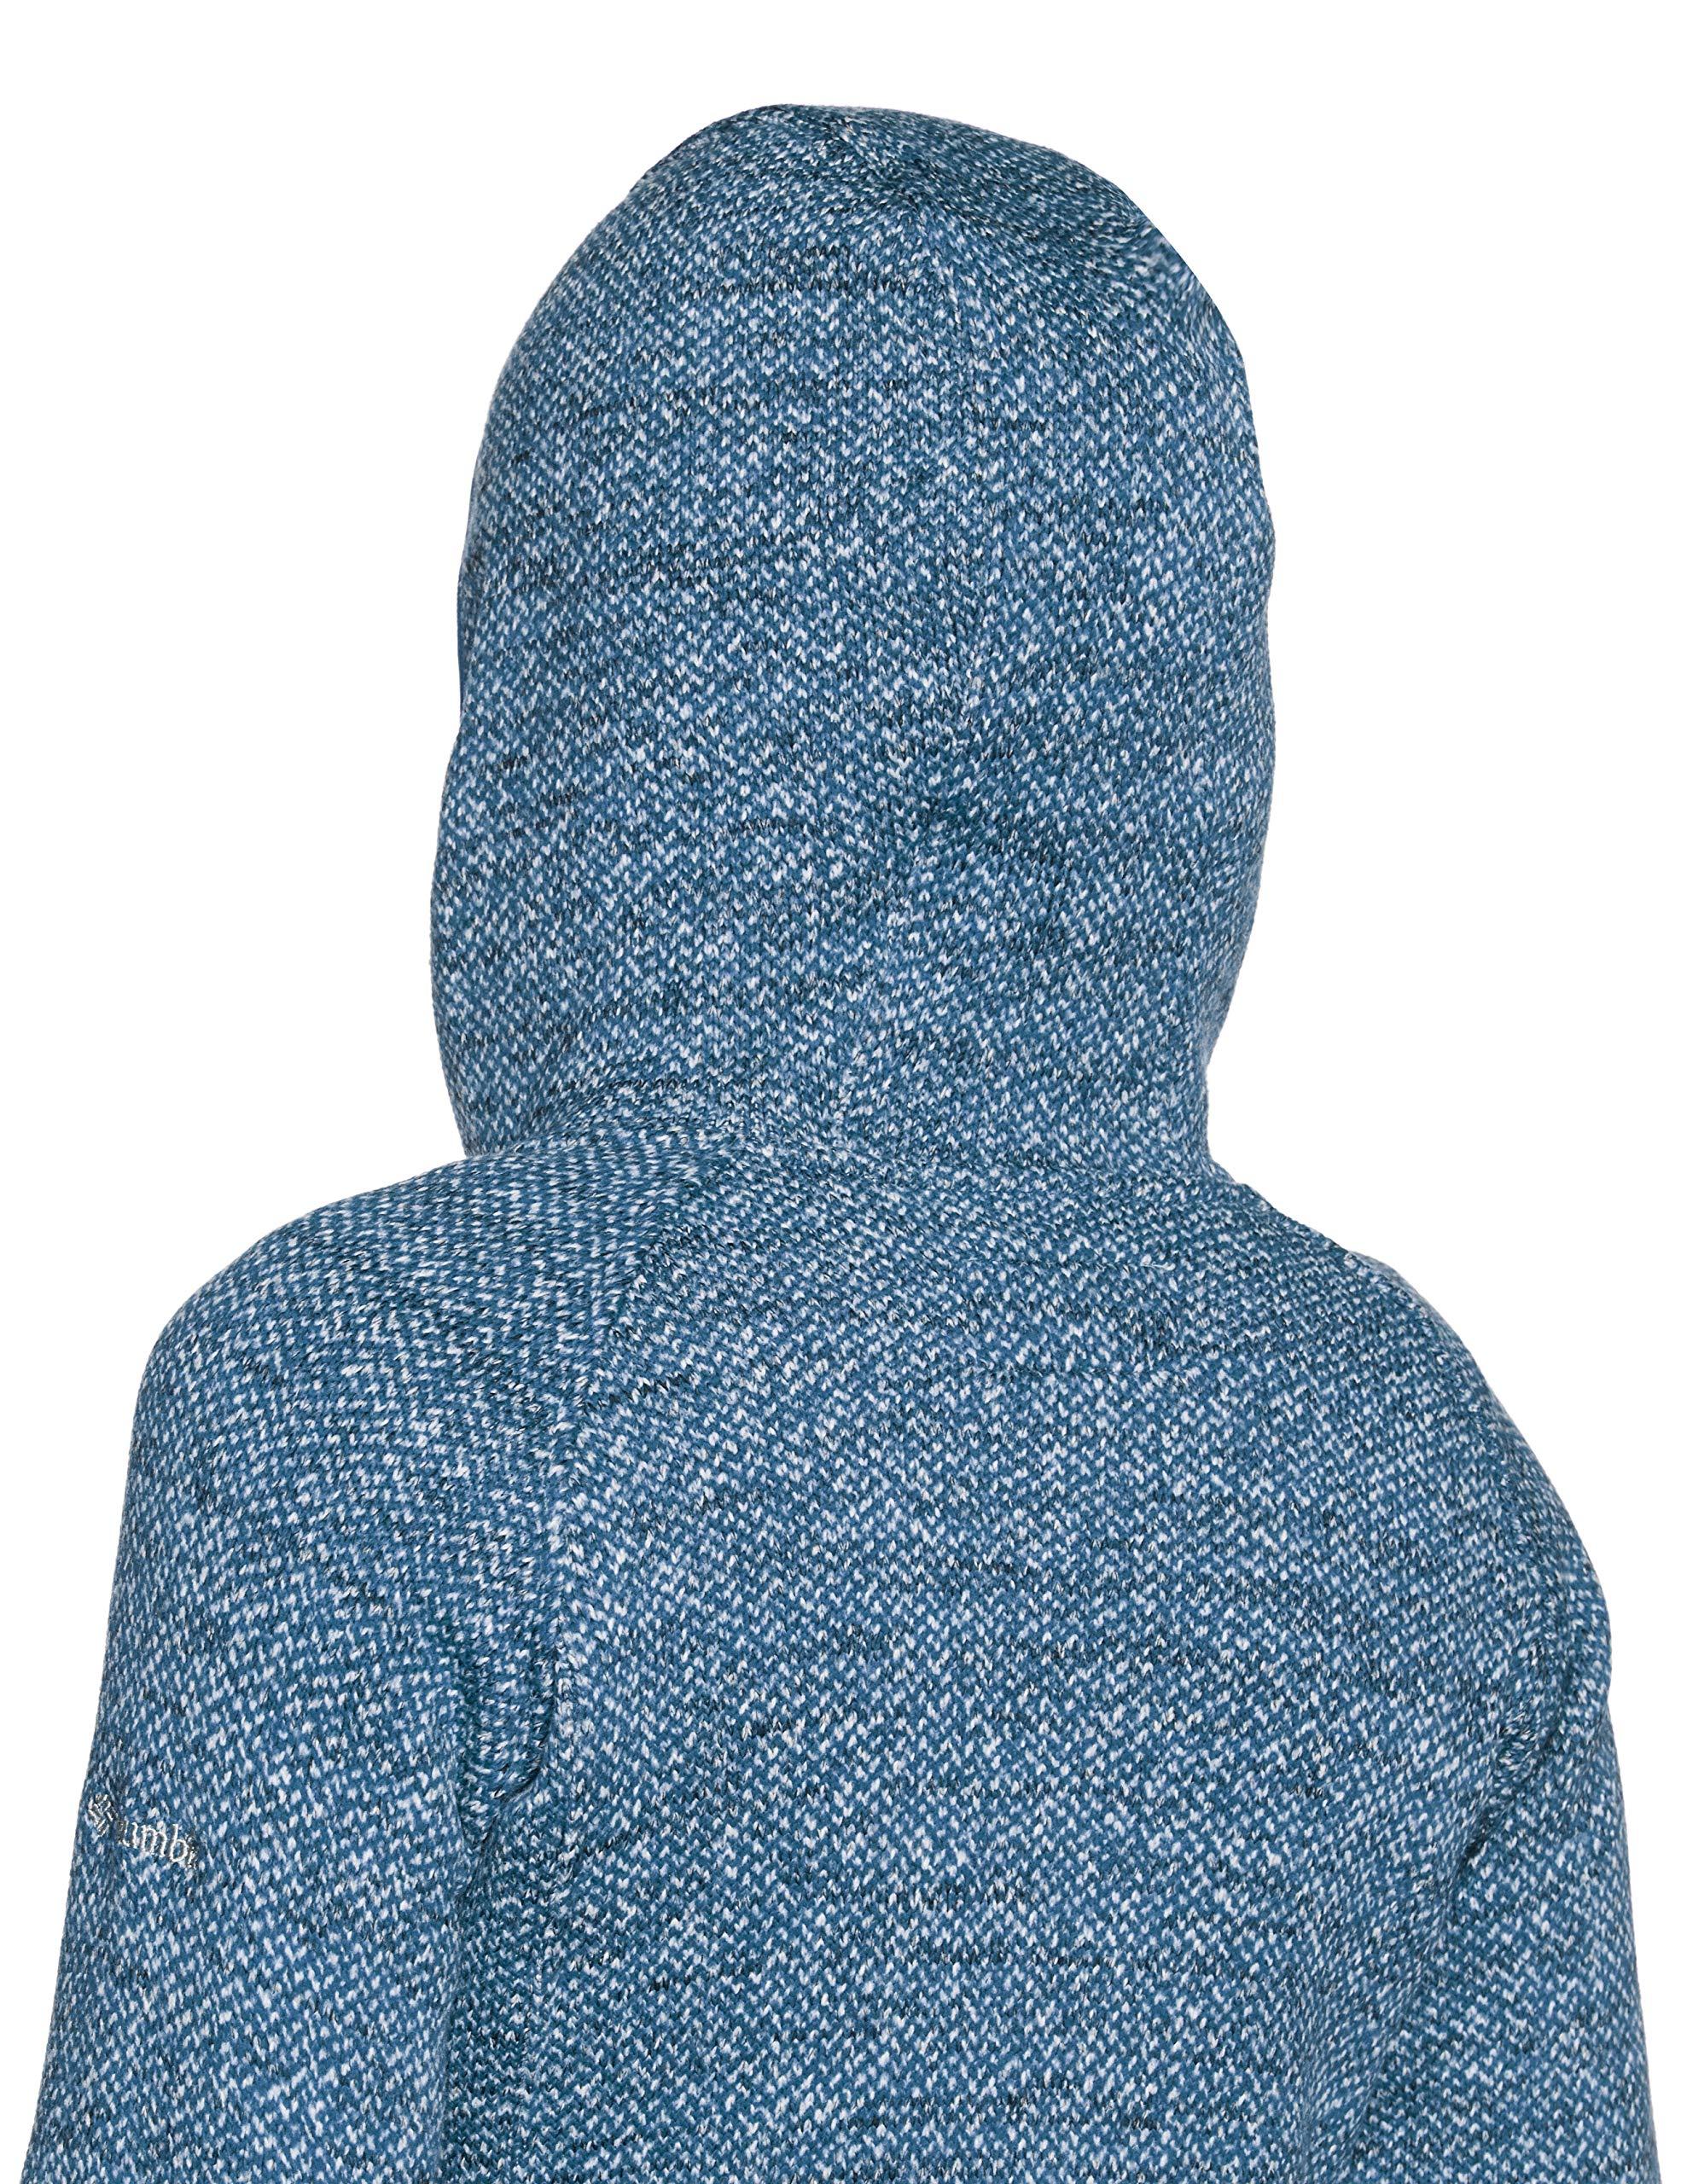 A118Z SntvL - Columbia Women's Fleece Pullover, Chillin